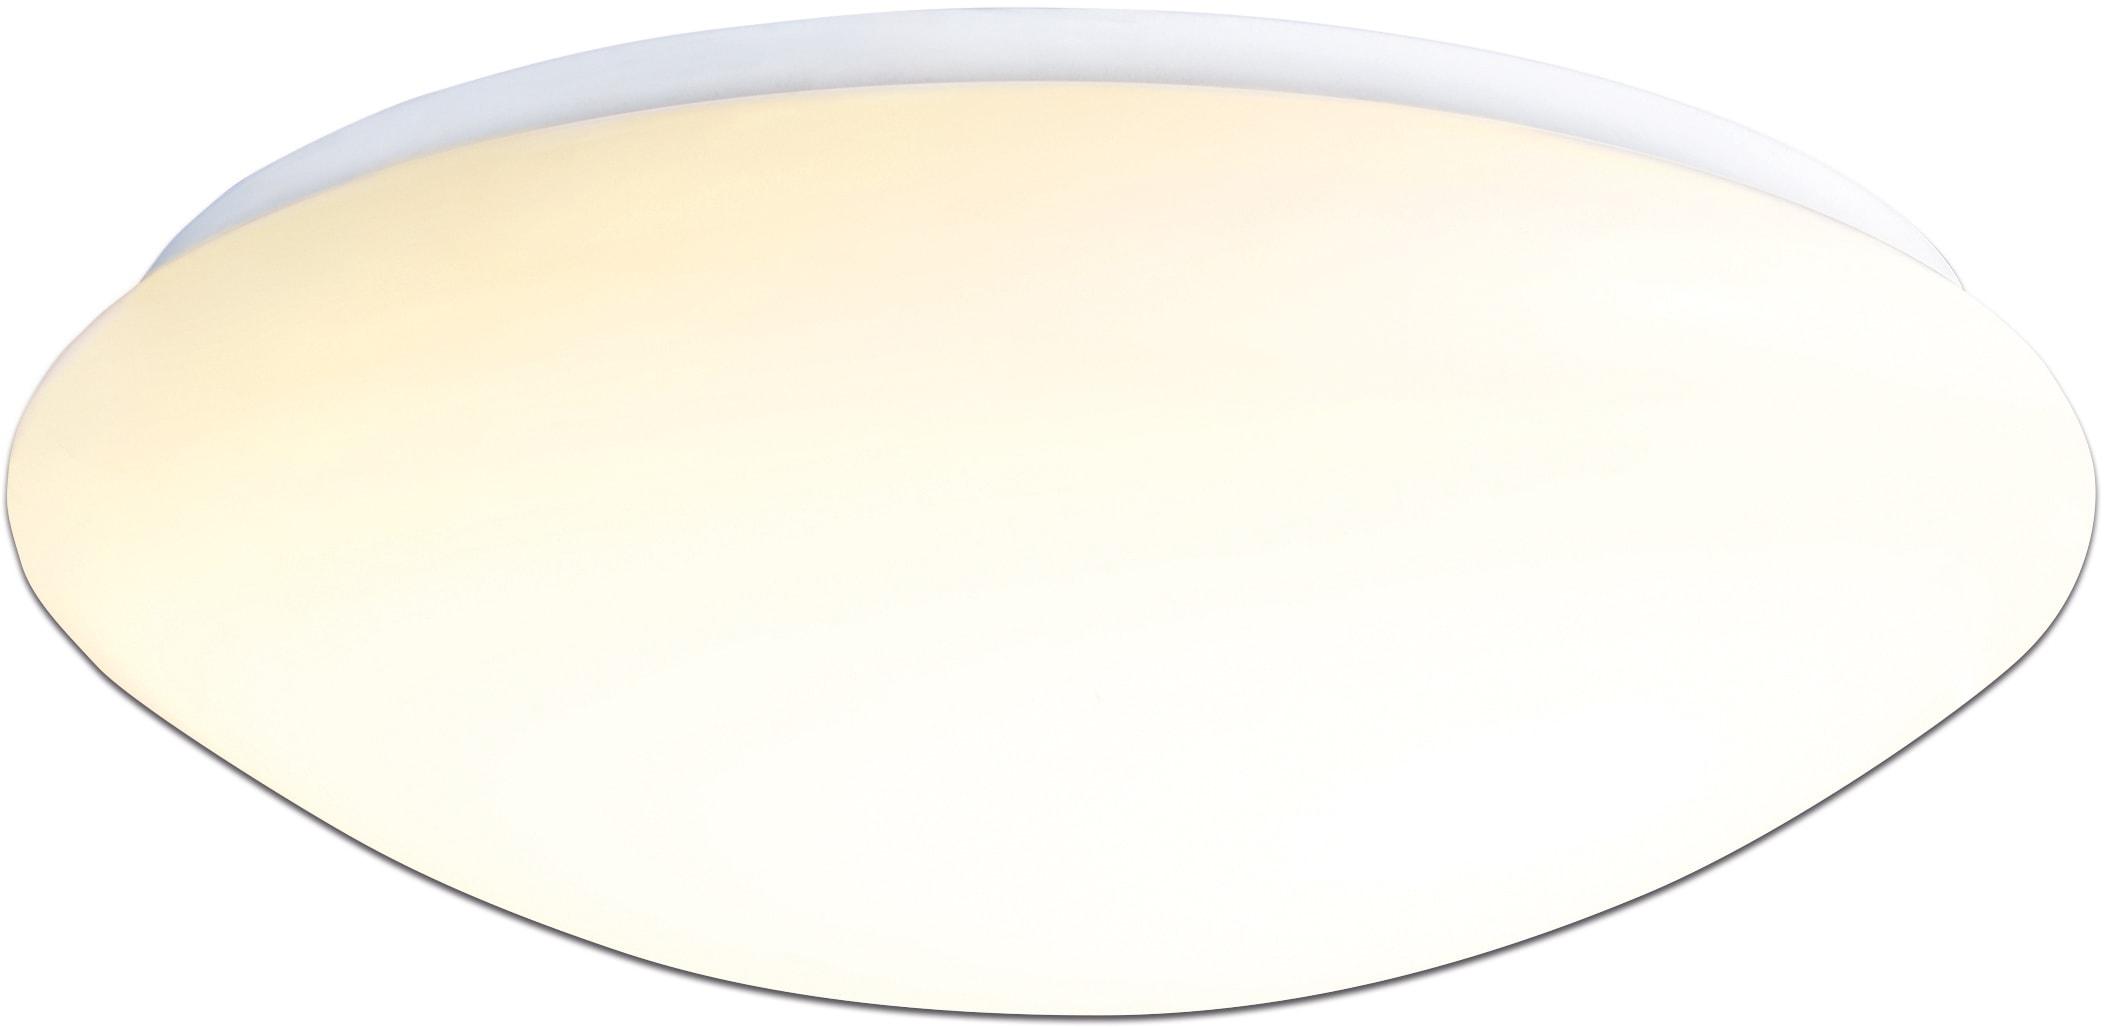 näve LED Deckenleuchte Dublin, LED-Board, LED Deckenlampe